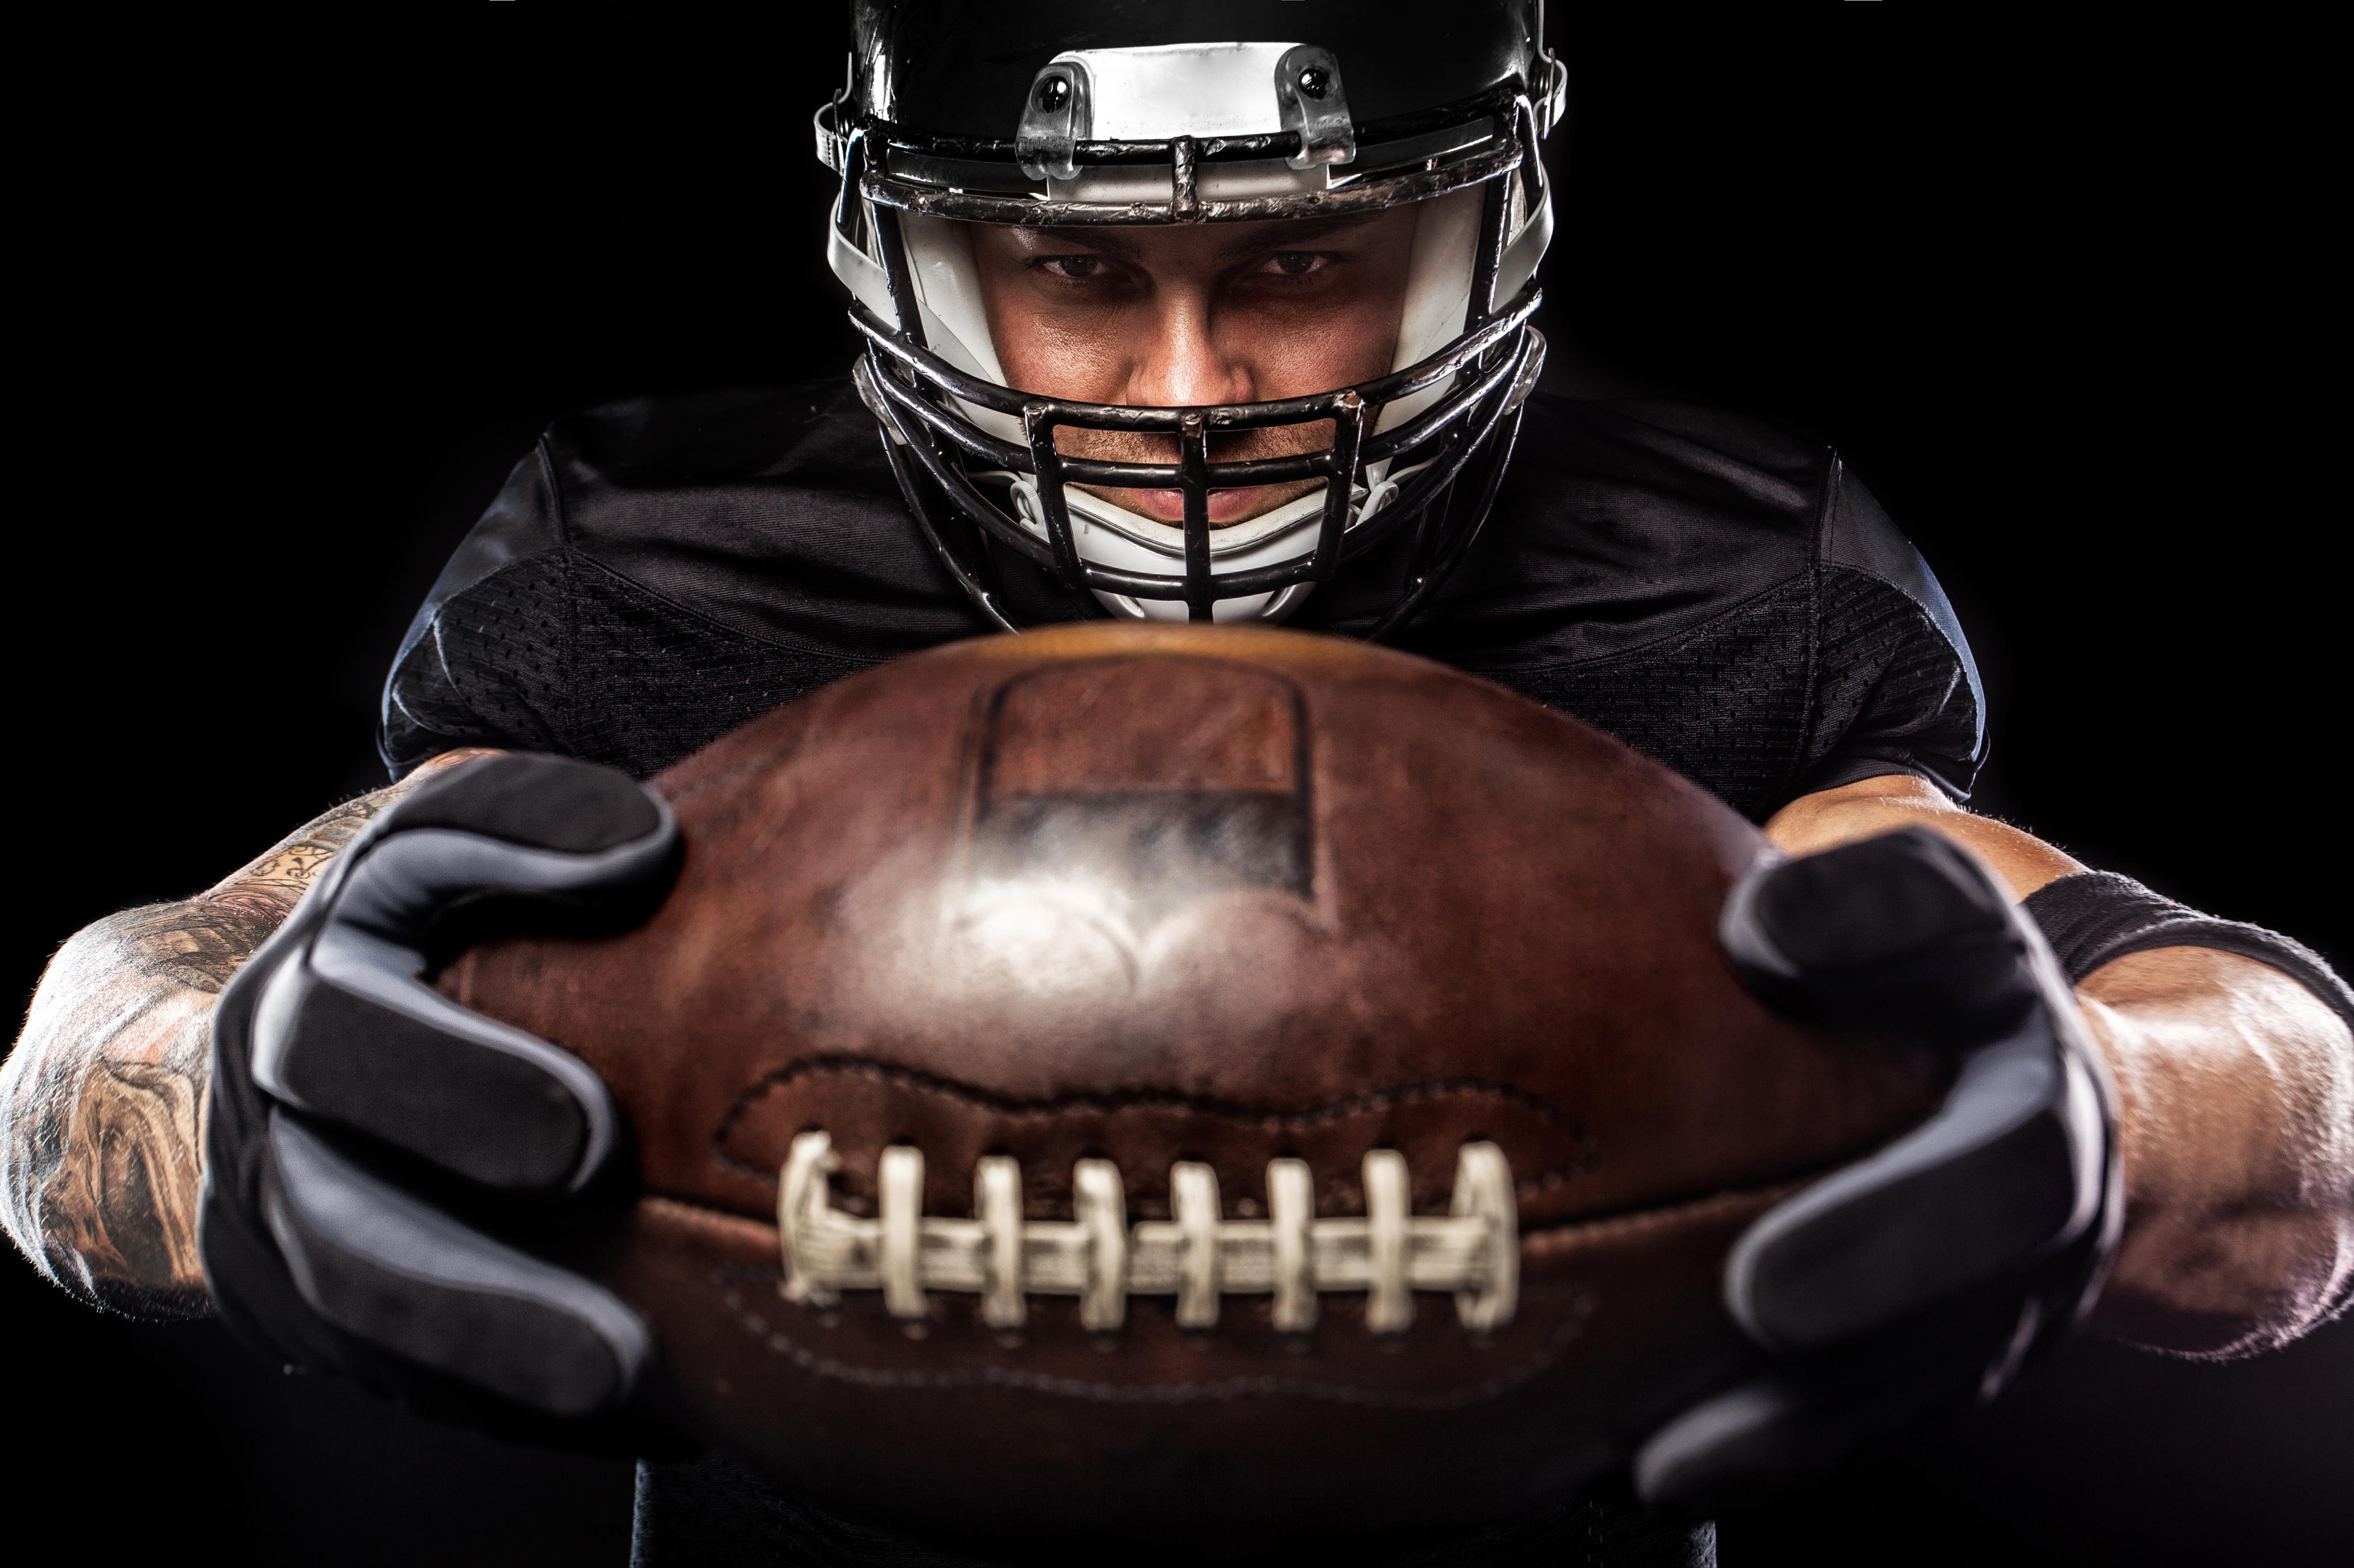 Фотографии в шлеме мужчина Американский футбол спортивные Мячик униформе на черном фоне 4204x2800 Шлем шлема Мужчины Спорт спортивный спортивная Мяч Униформа Черный фон